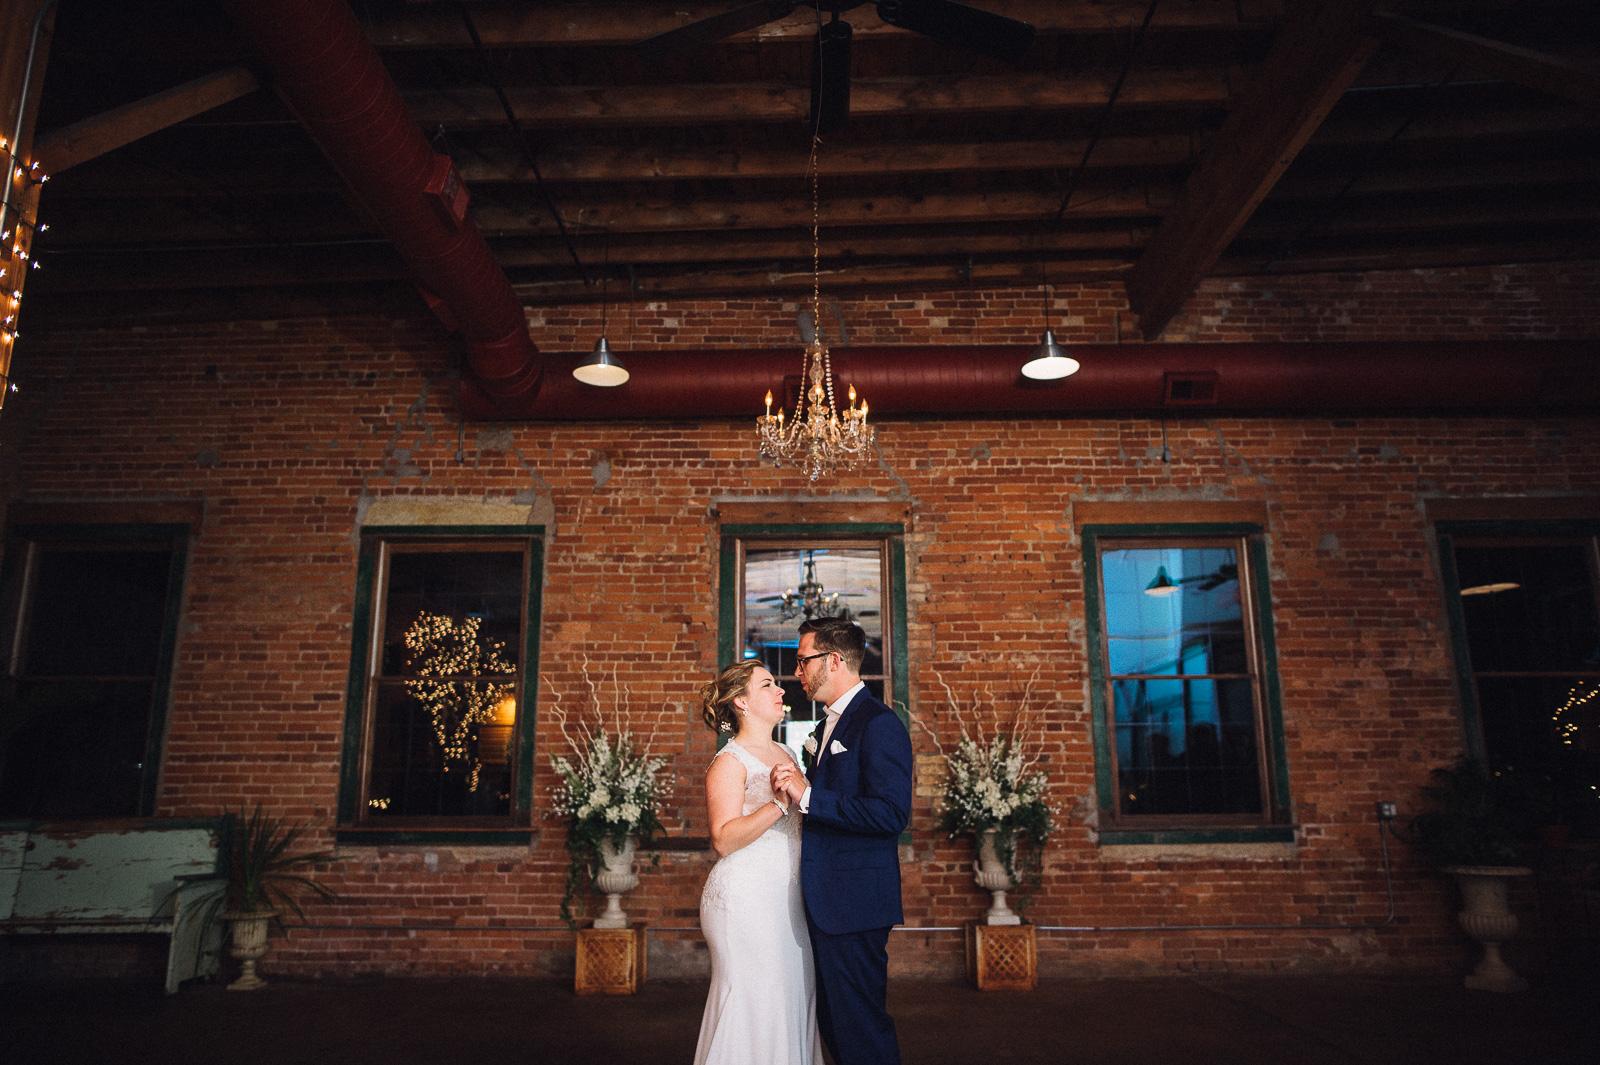 Blumen Gardens, Sycamore Illinois Wedding // Candace + Douglas - Fox ...